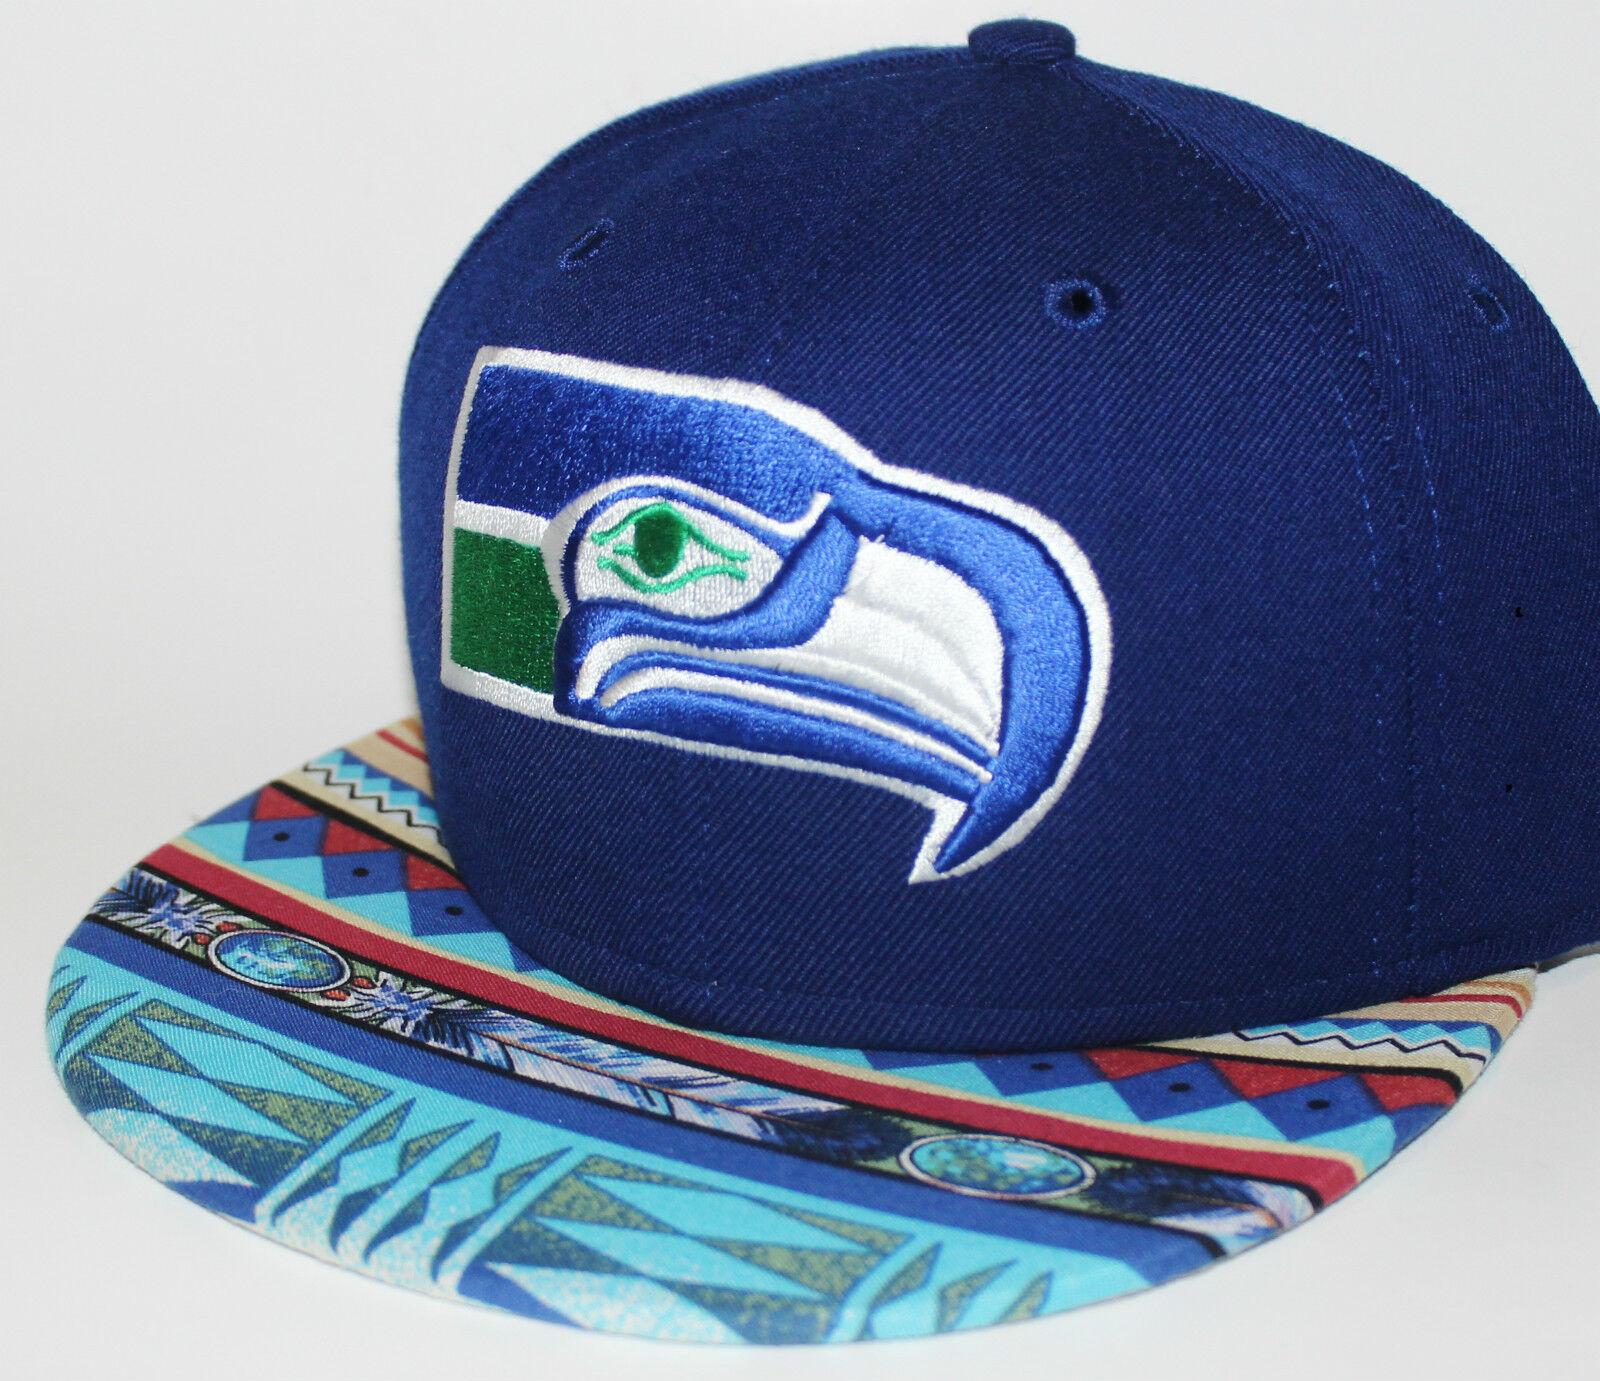 PICK1 Seattle Seahawks Native / Galaxy / Weed Bri… - image 6